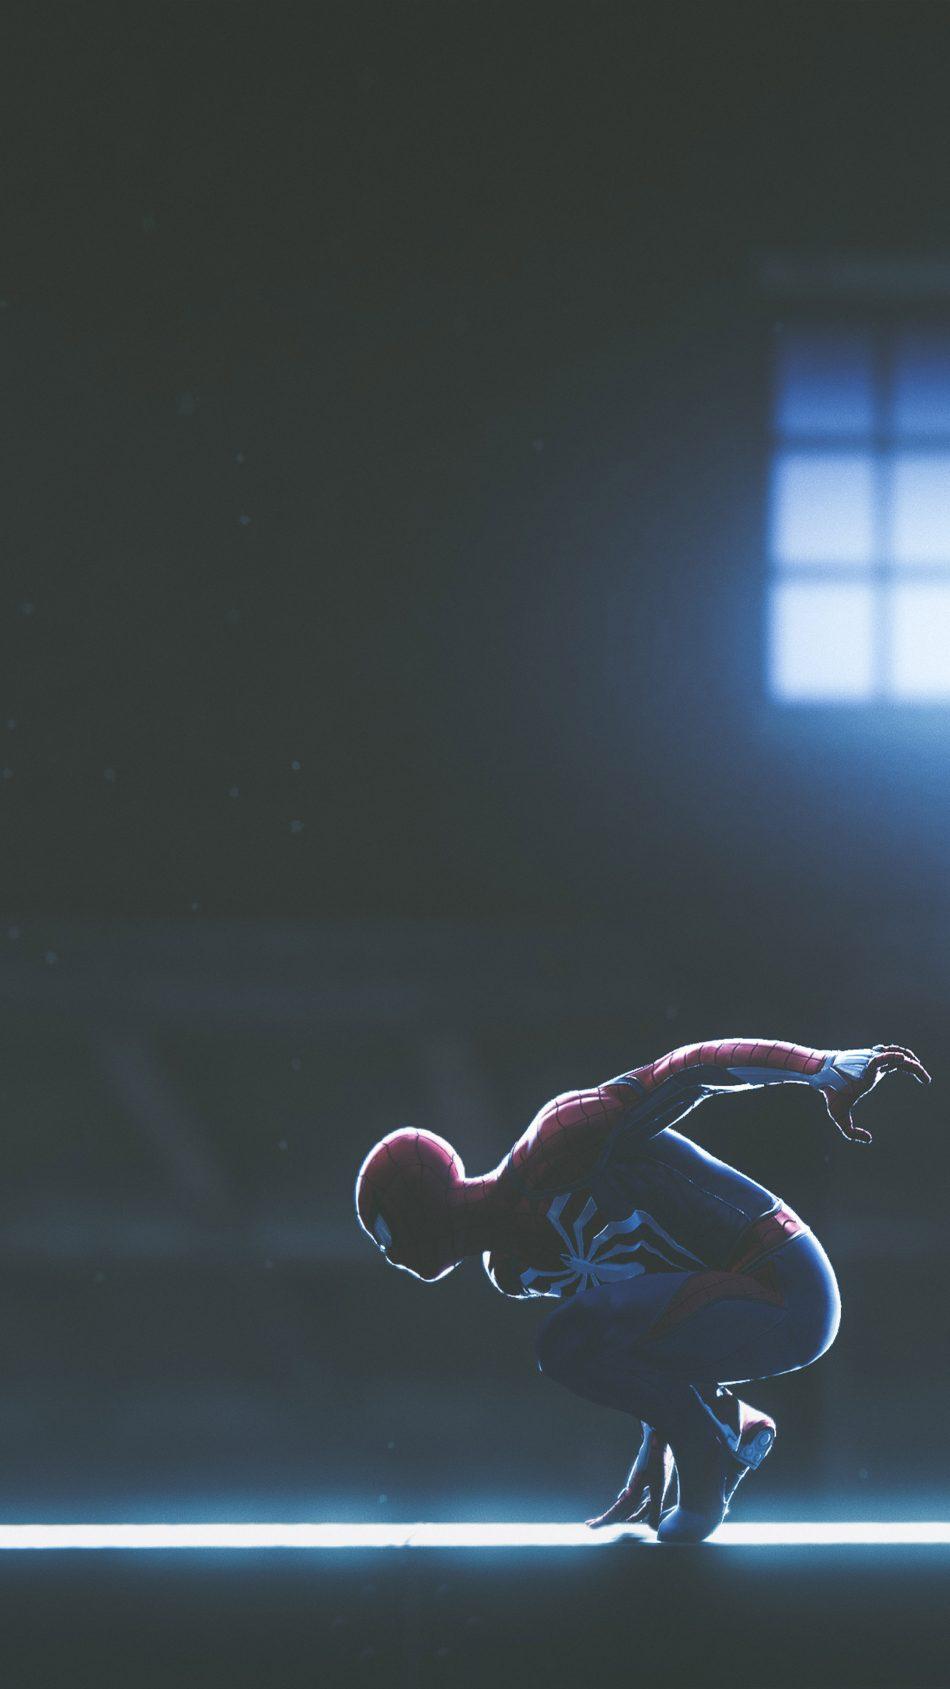 Spider Man Playstation 4 Gameplay 2018 4k Ultra Hd Mobile Wallpaper